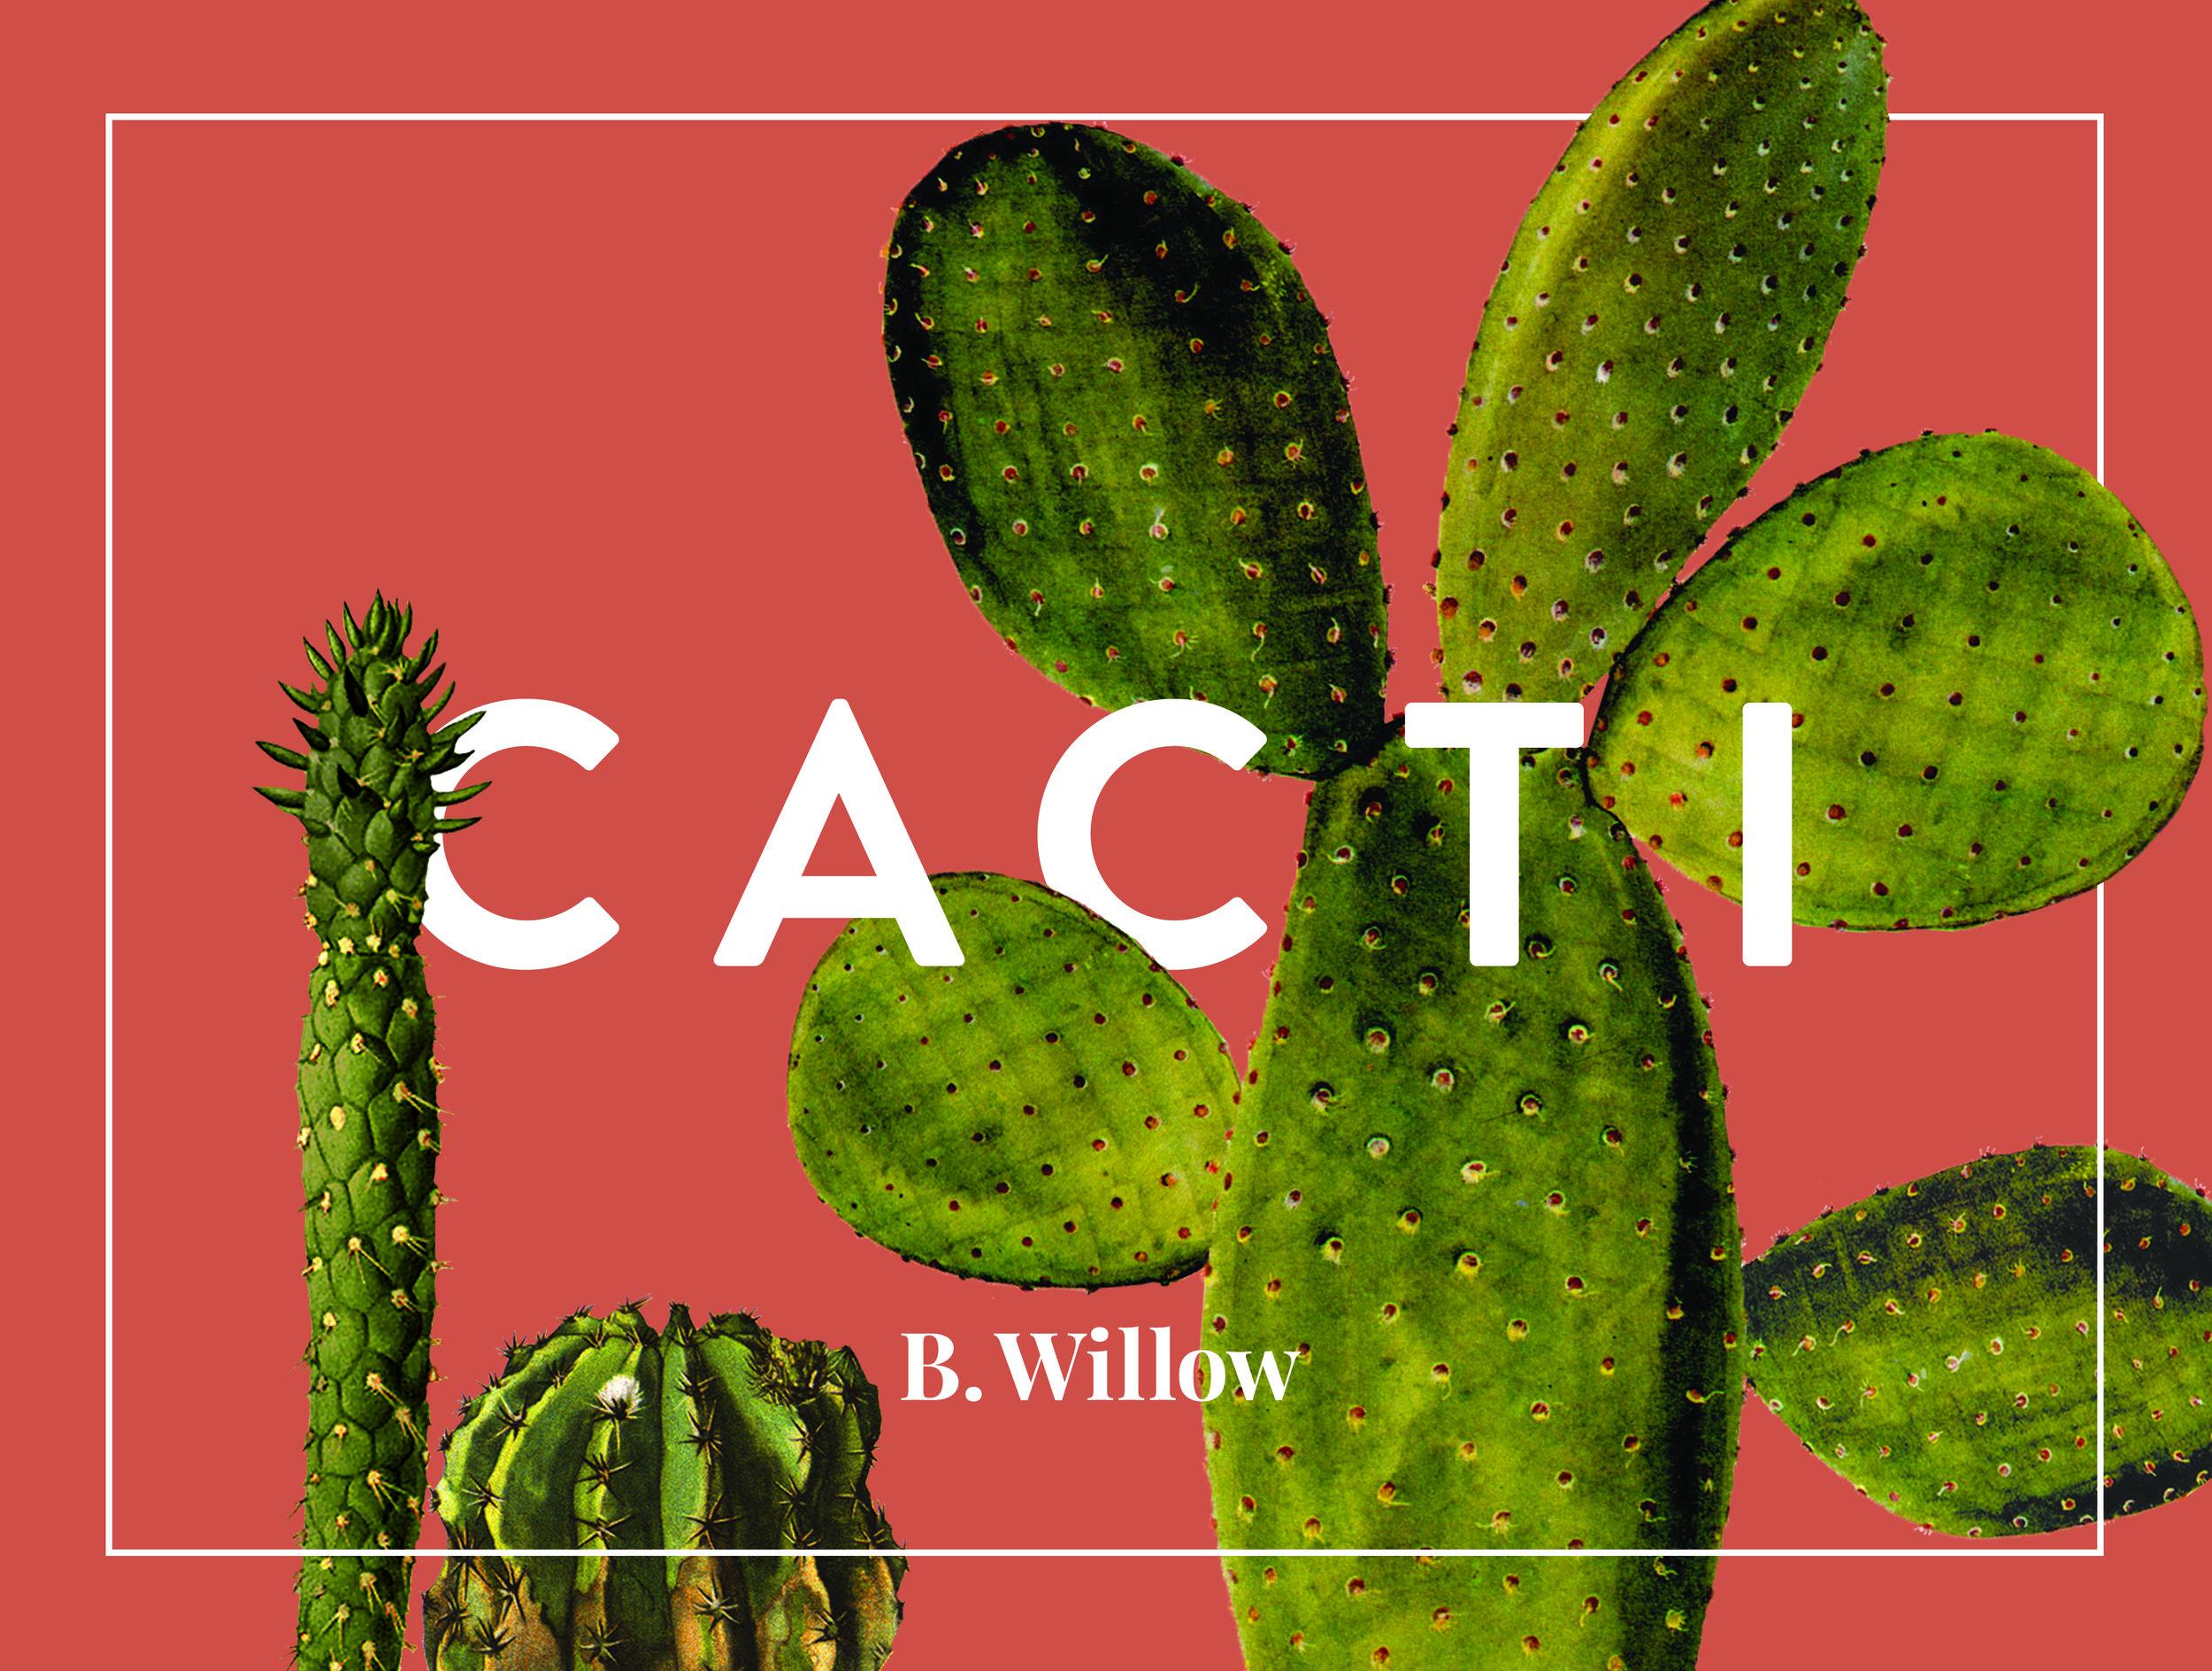 Cacti-Front.jpg